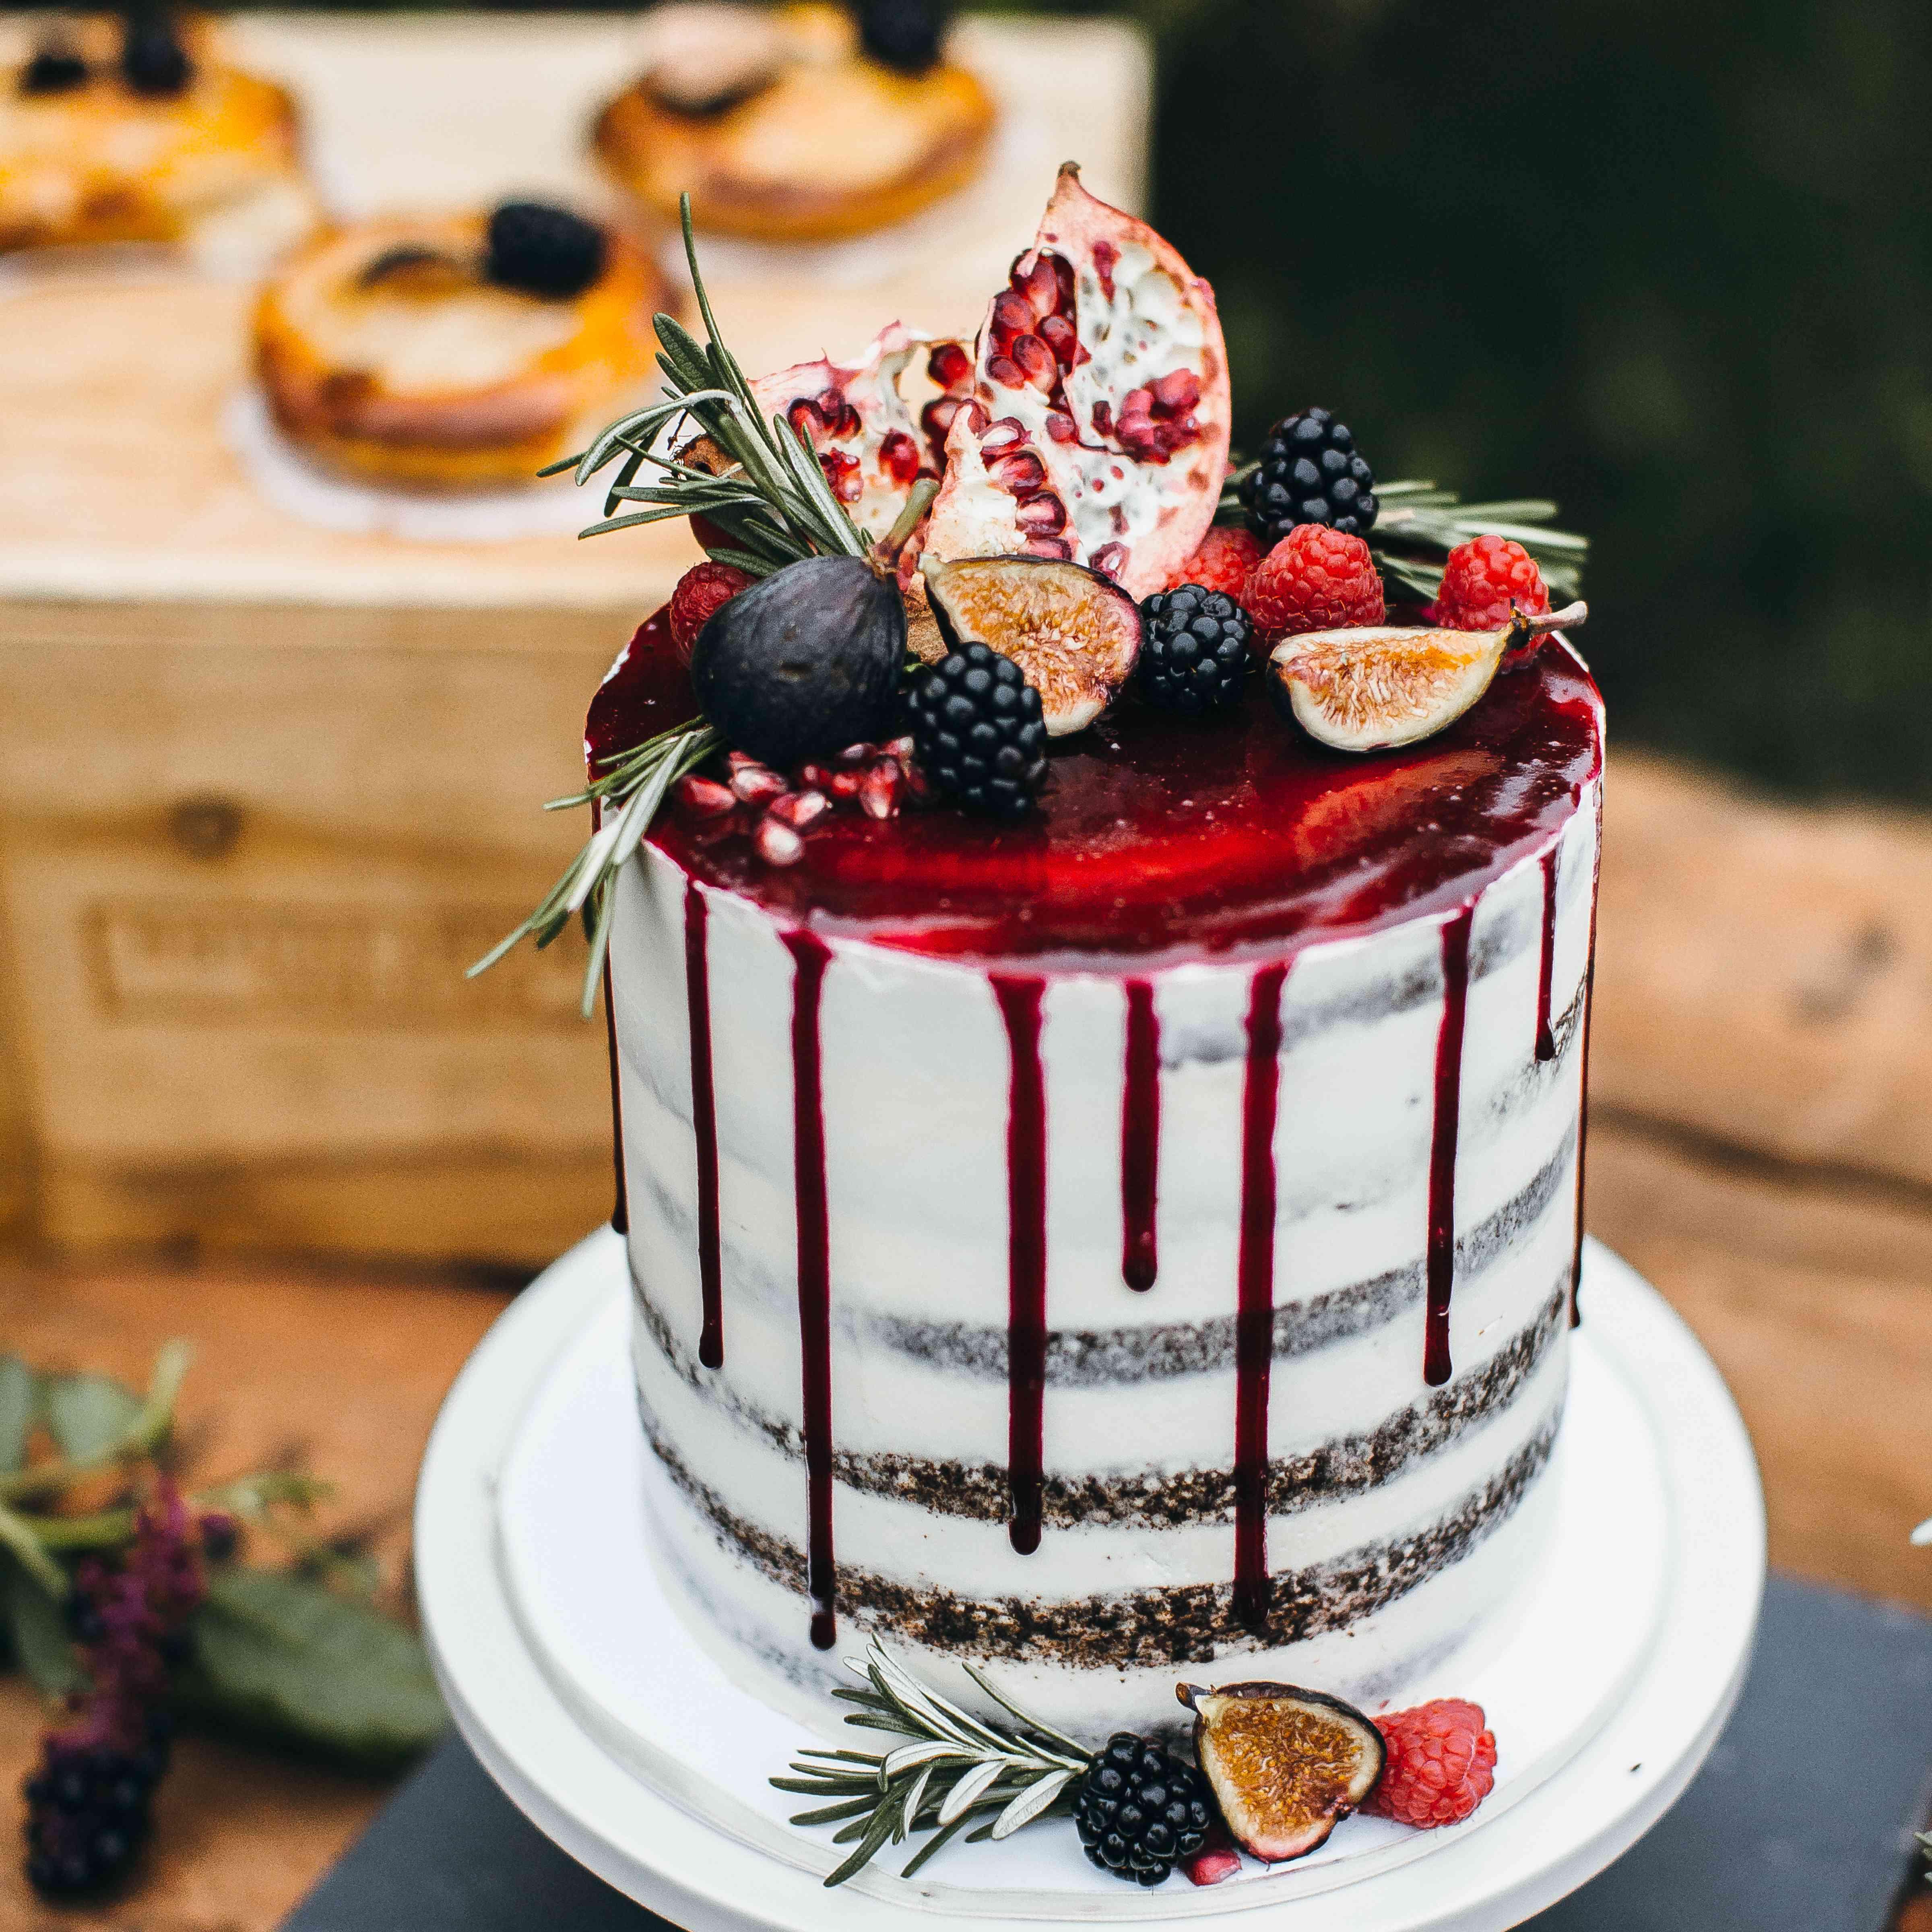 Nearly-Naked Drip Wedding Cake with Red Glaze